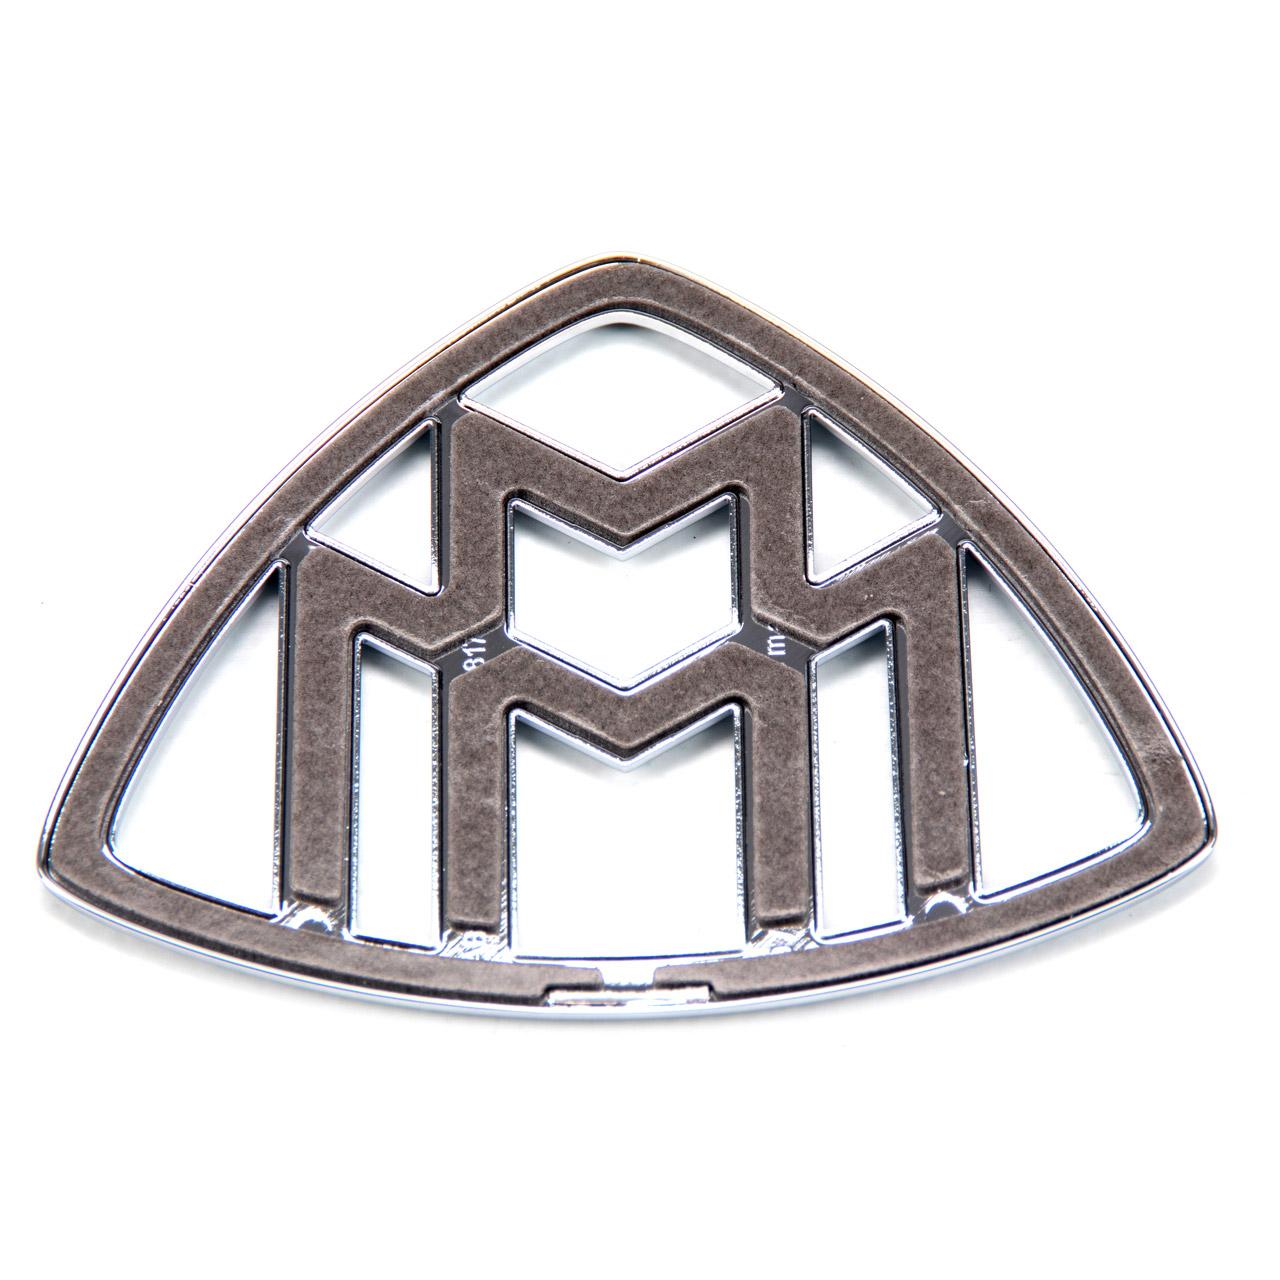 ORIGINAL Mercedes MAYBACH Emblem Logo Plakette W463 W222 2228171200